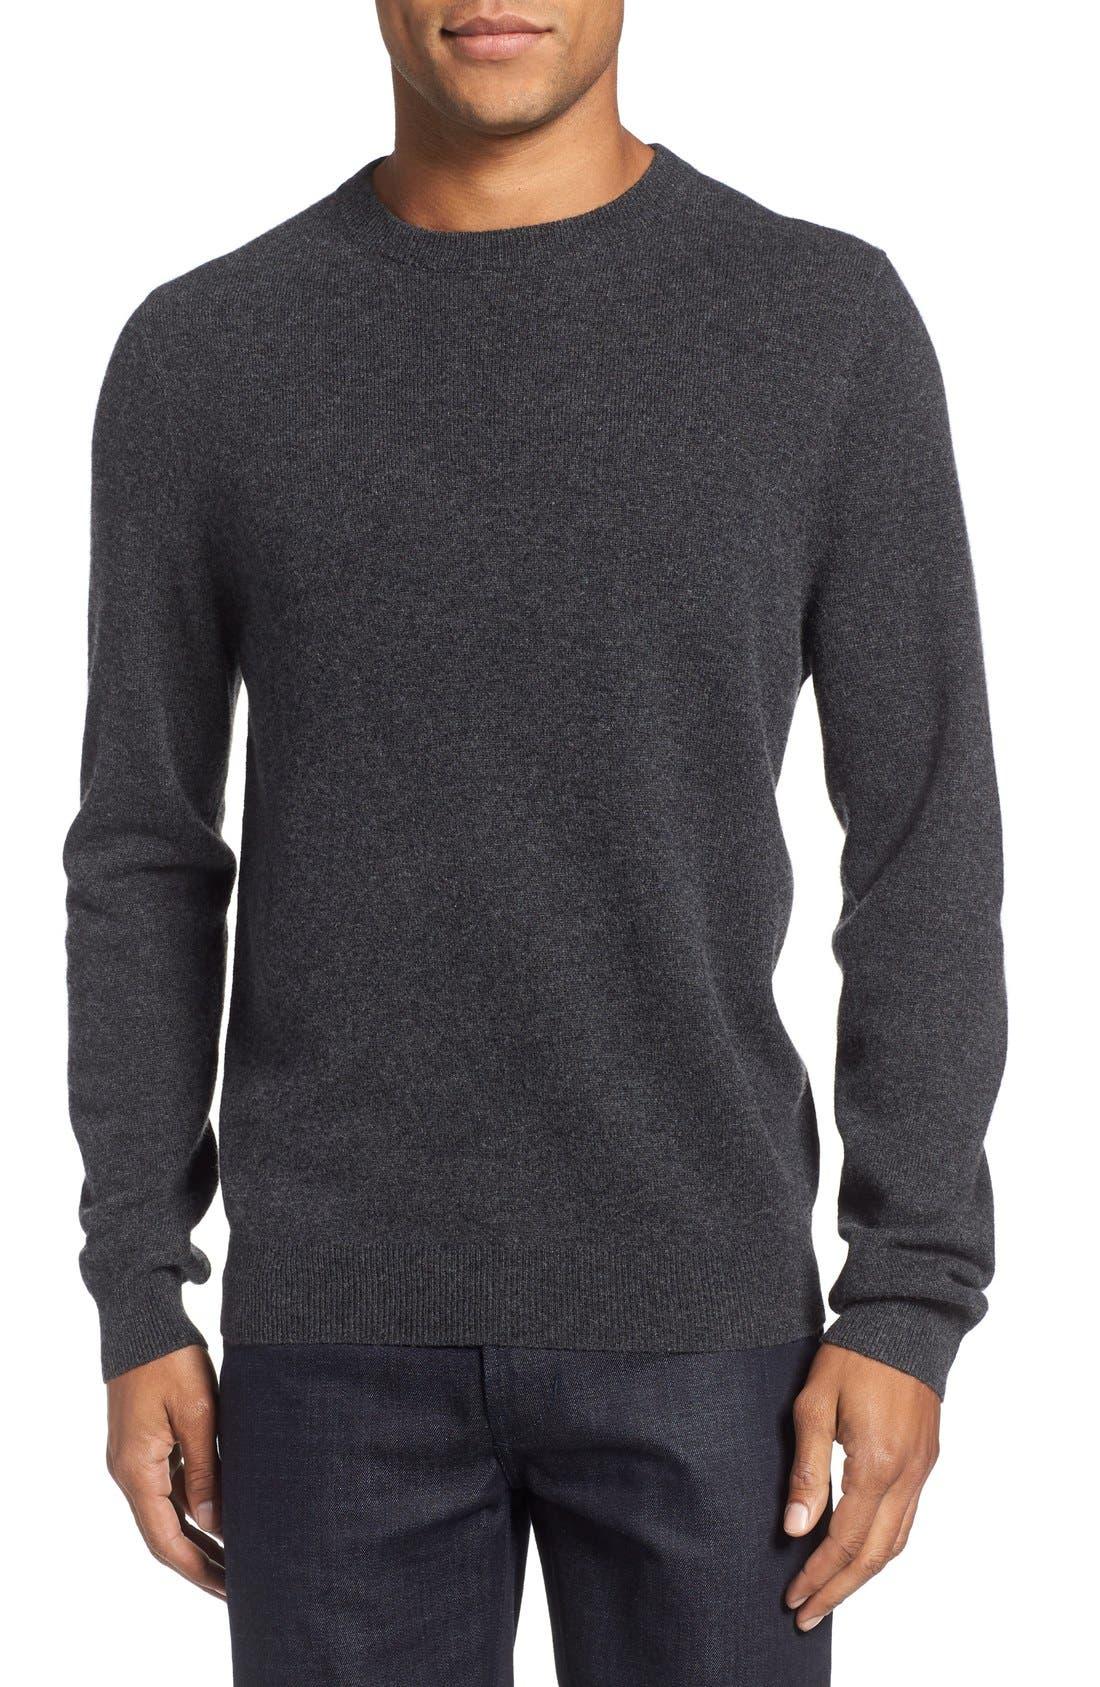 Nordstrom Shop Cashmere Crewneck Sweater, Grey